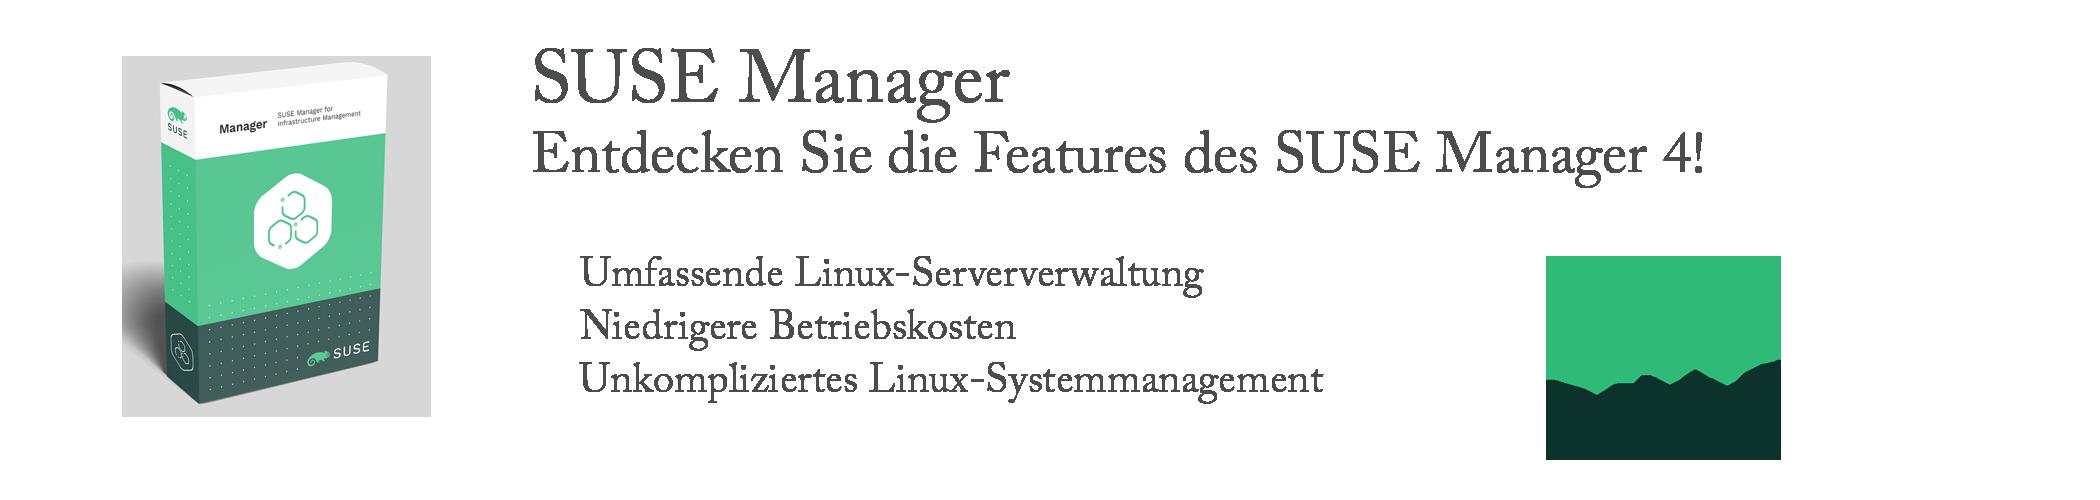 Slider_SUMA4_neues branding